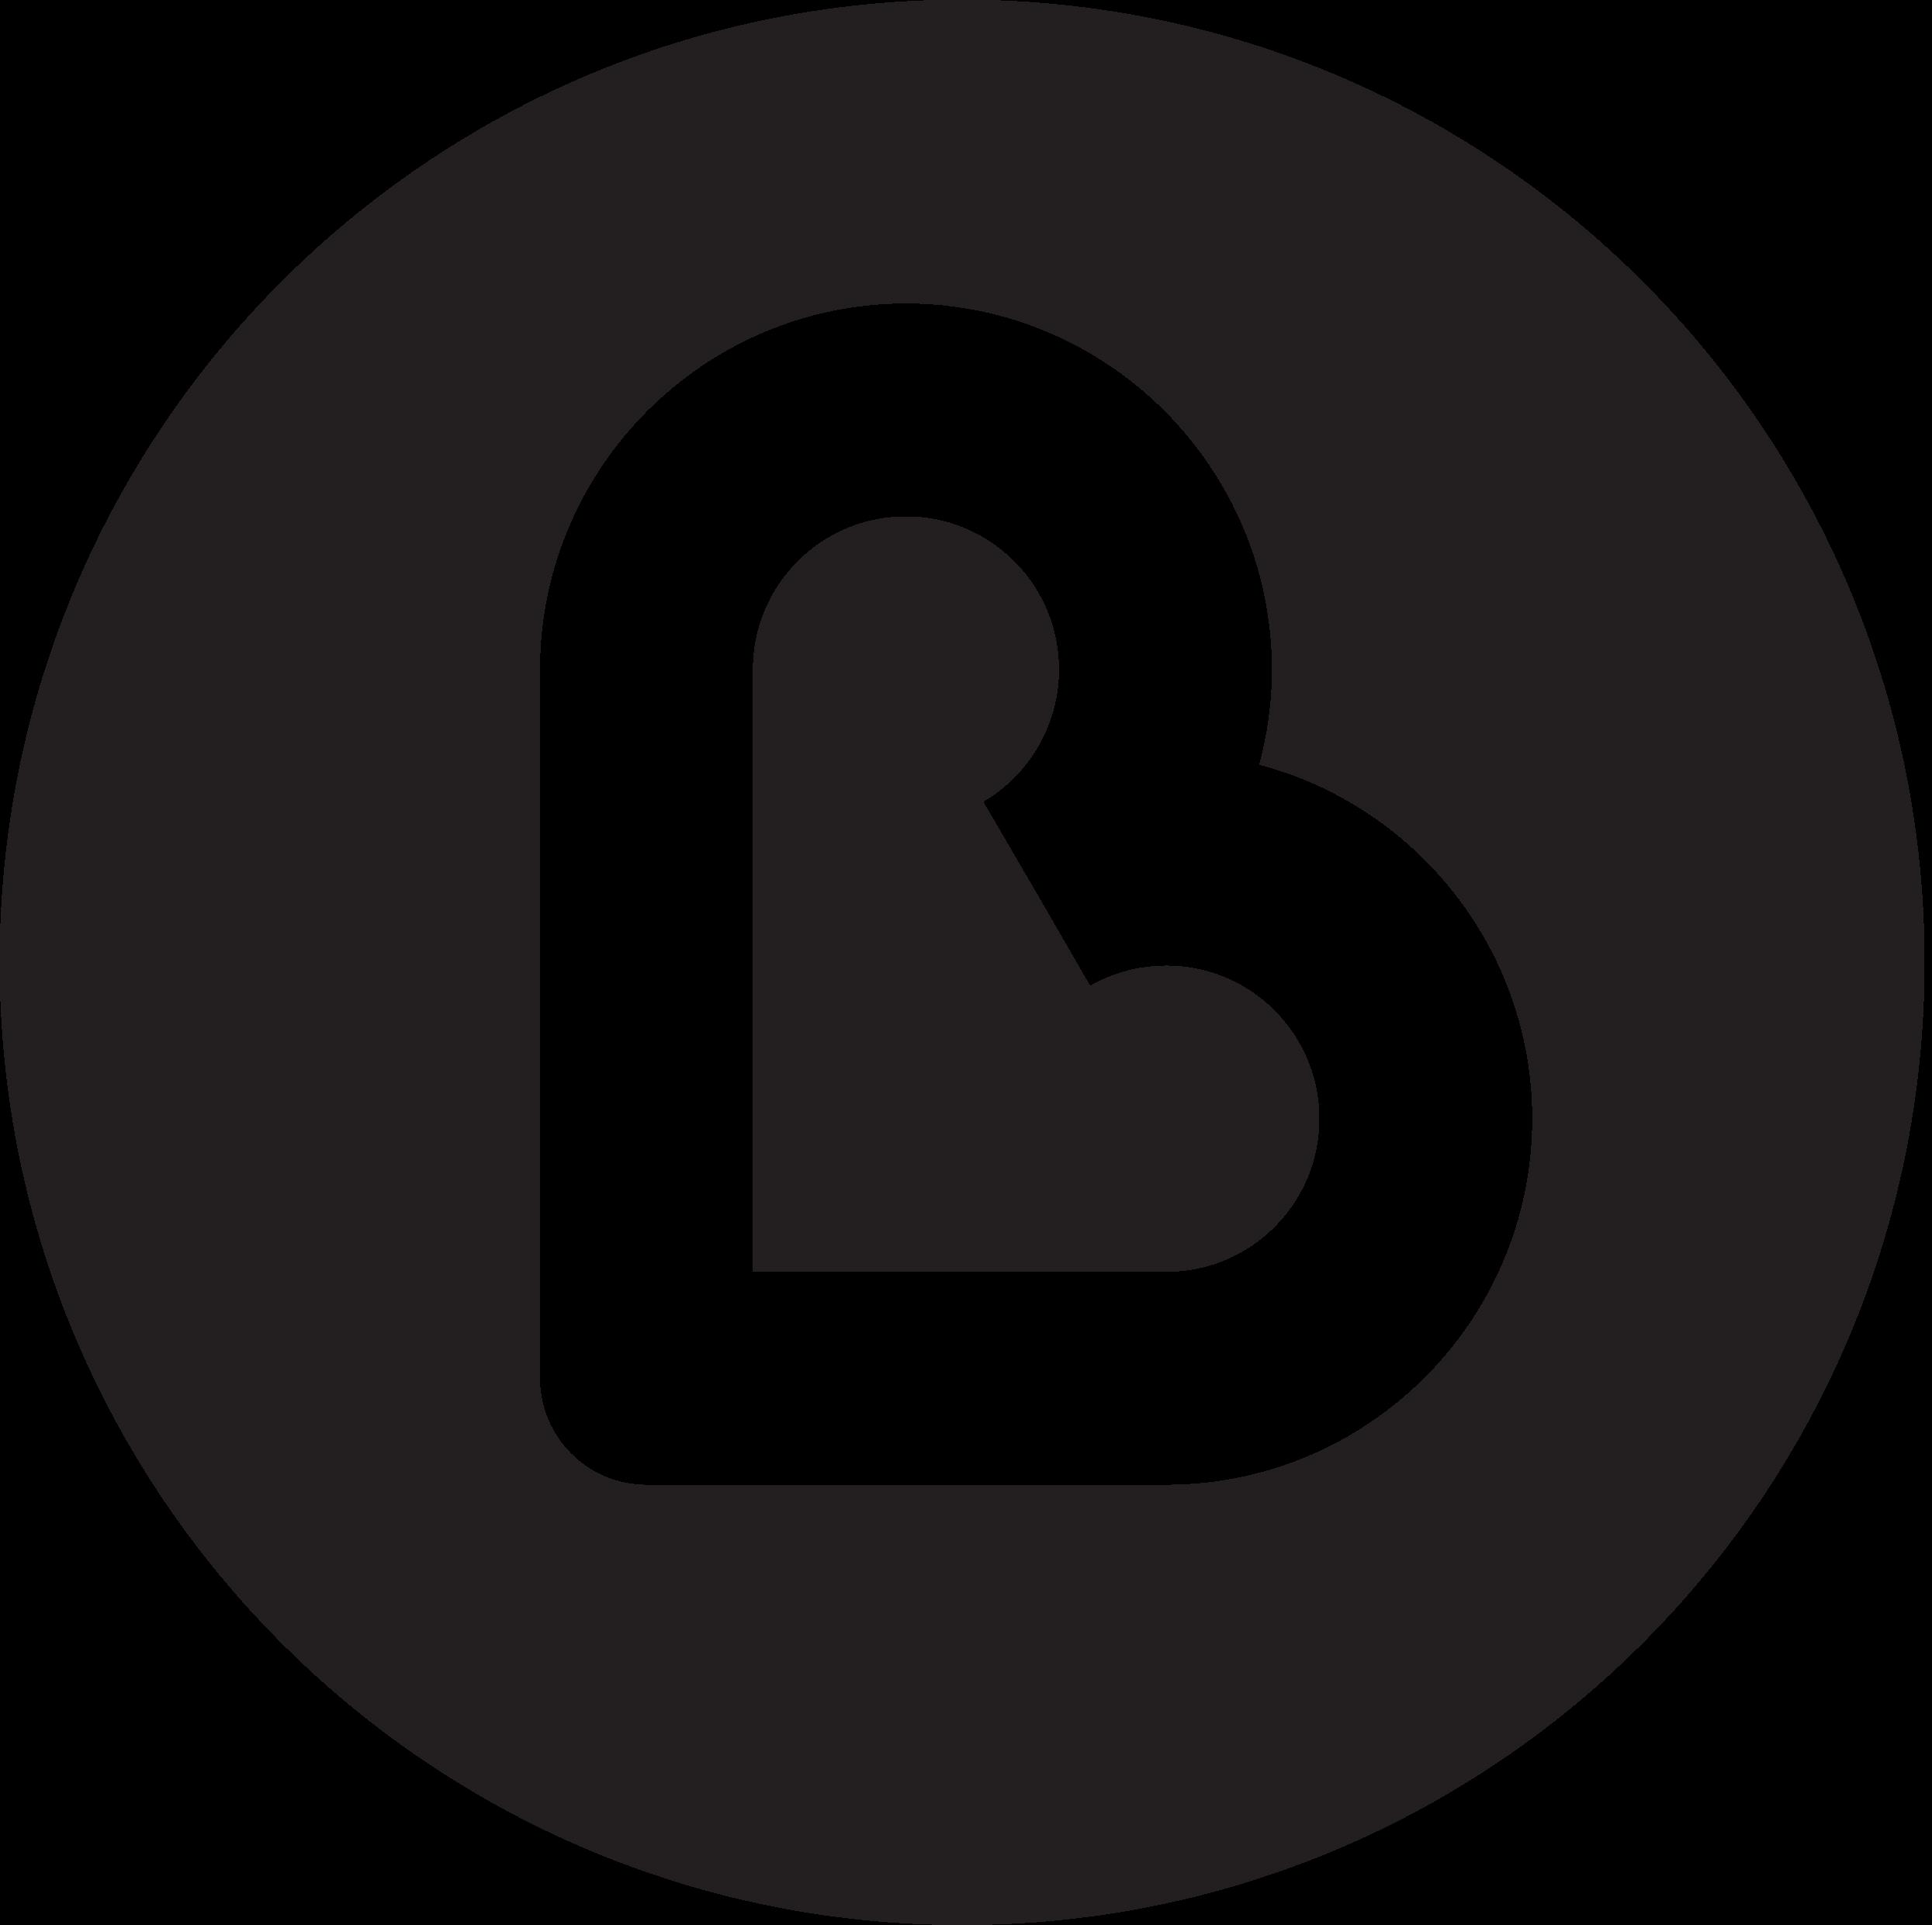 Benji's logo